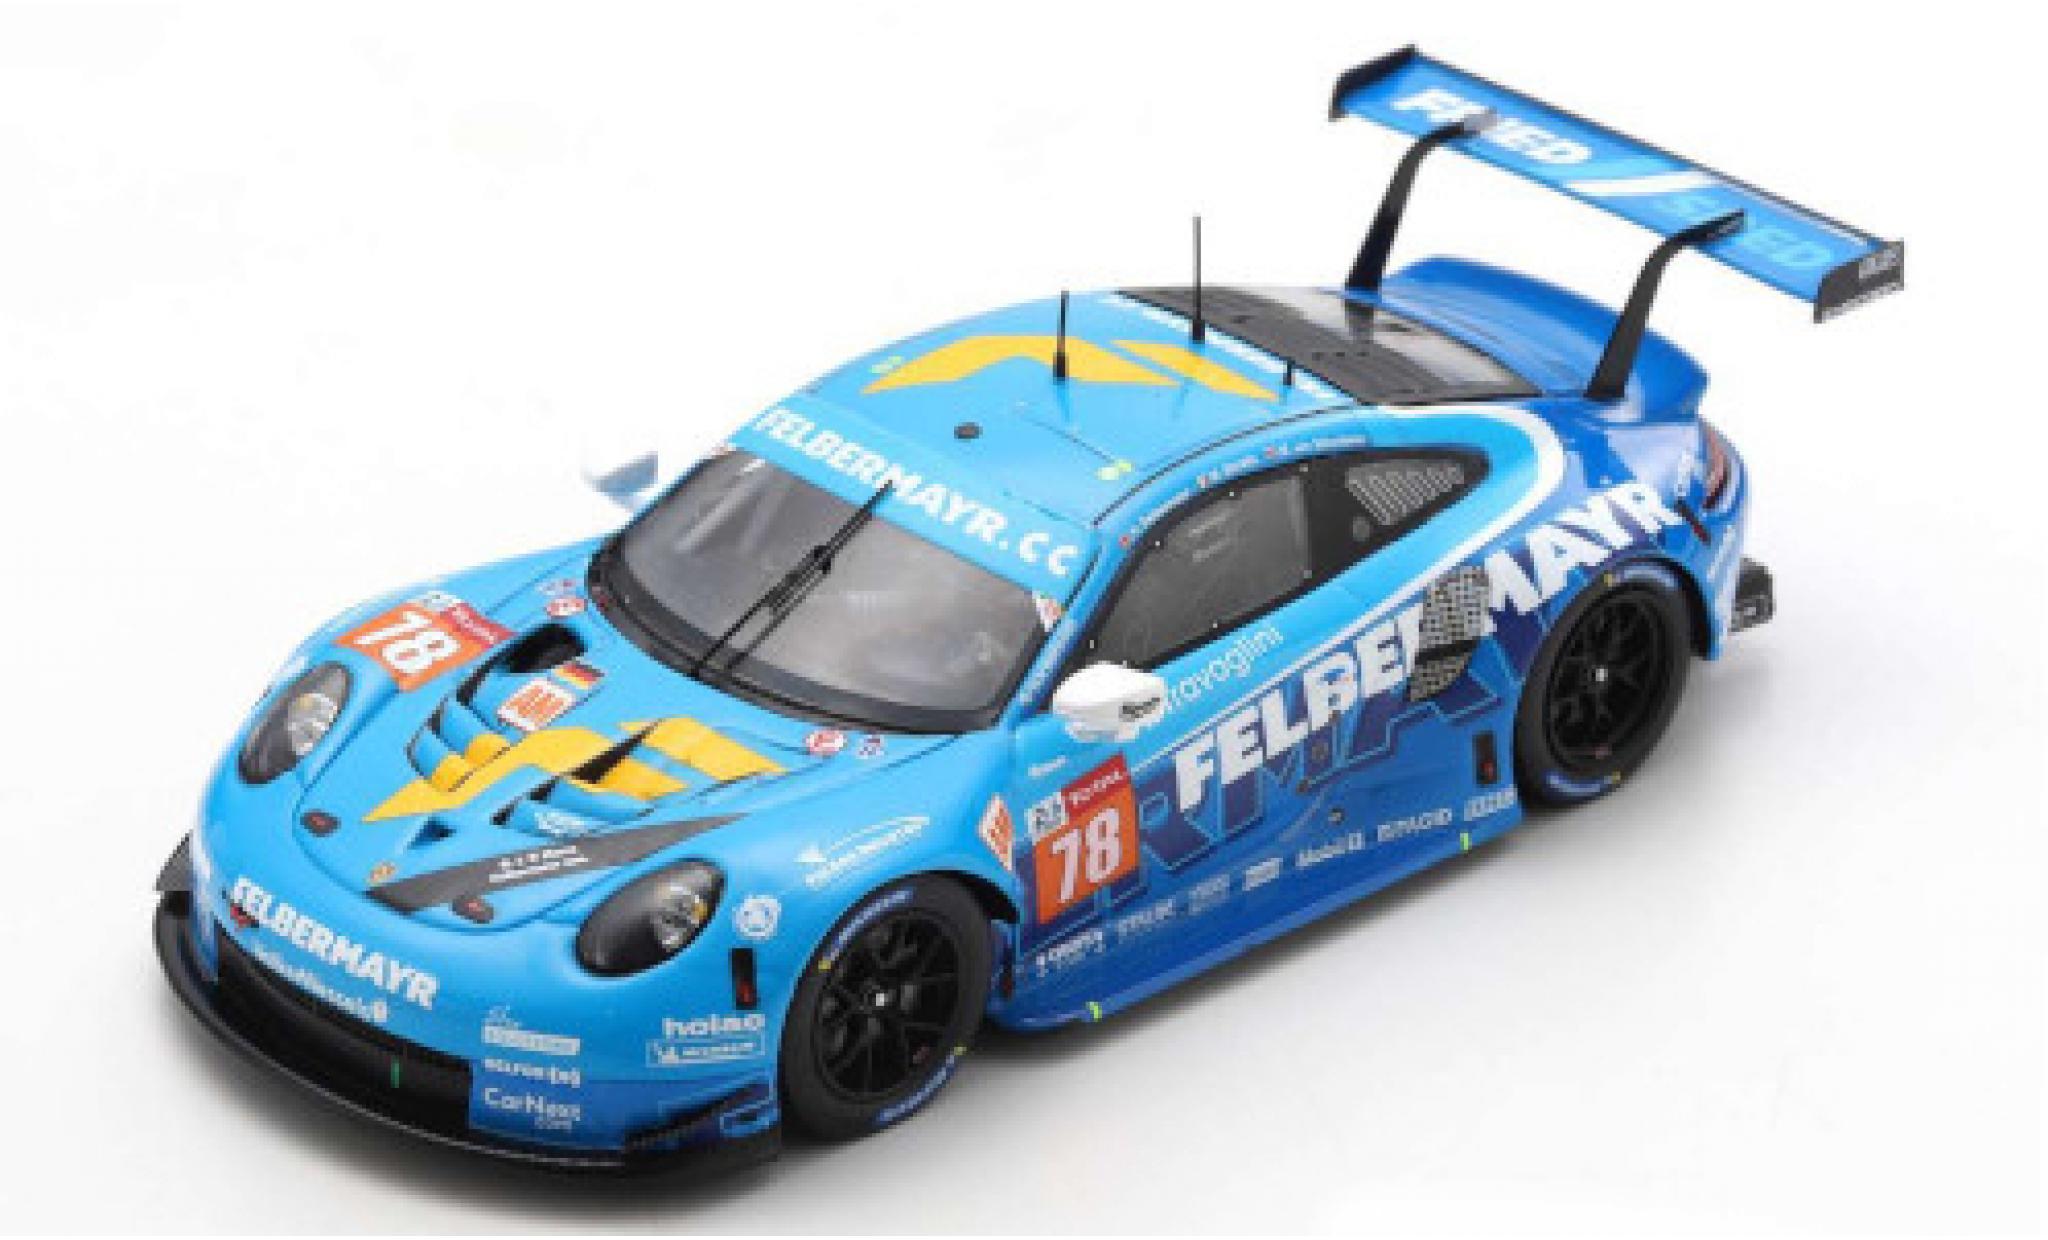 Porsche 992 RSR 1/43 Spark 911 No.78 Predon Competition 24h Le Mans 2020 M.Beretta/H.Felbermayr Jr./M.van Splunteren